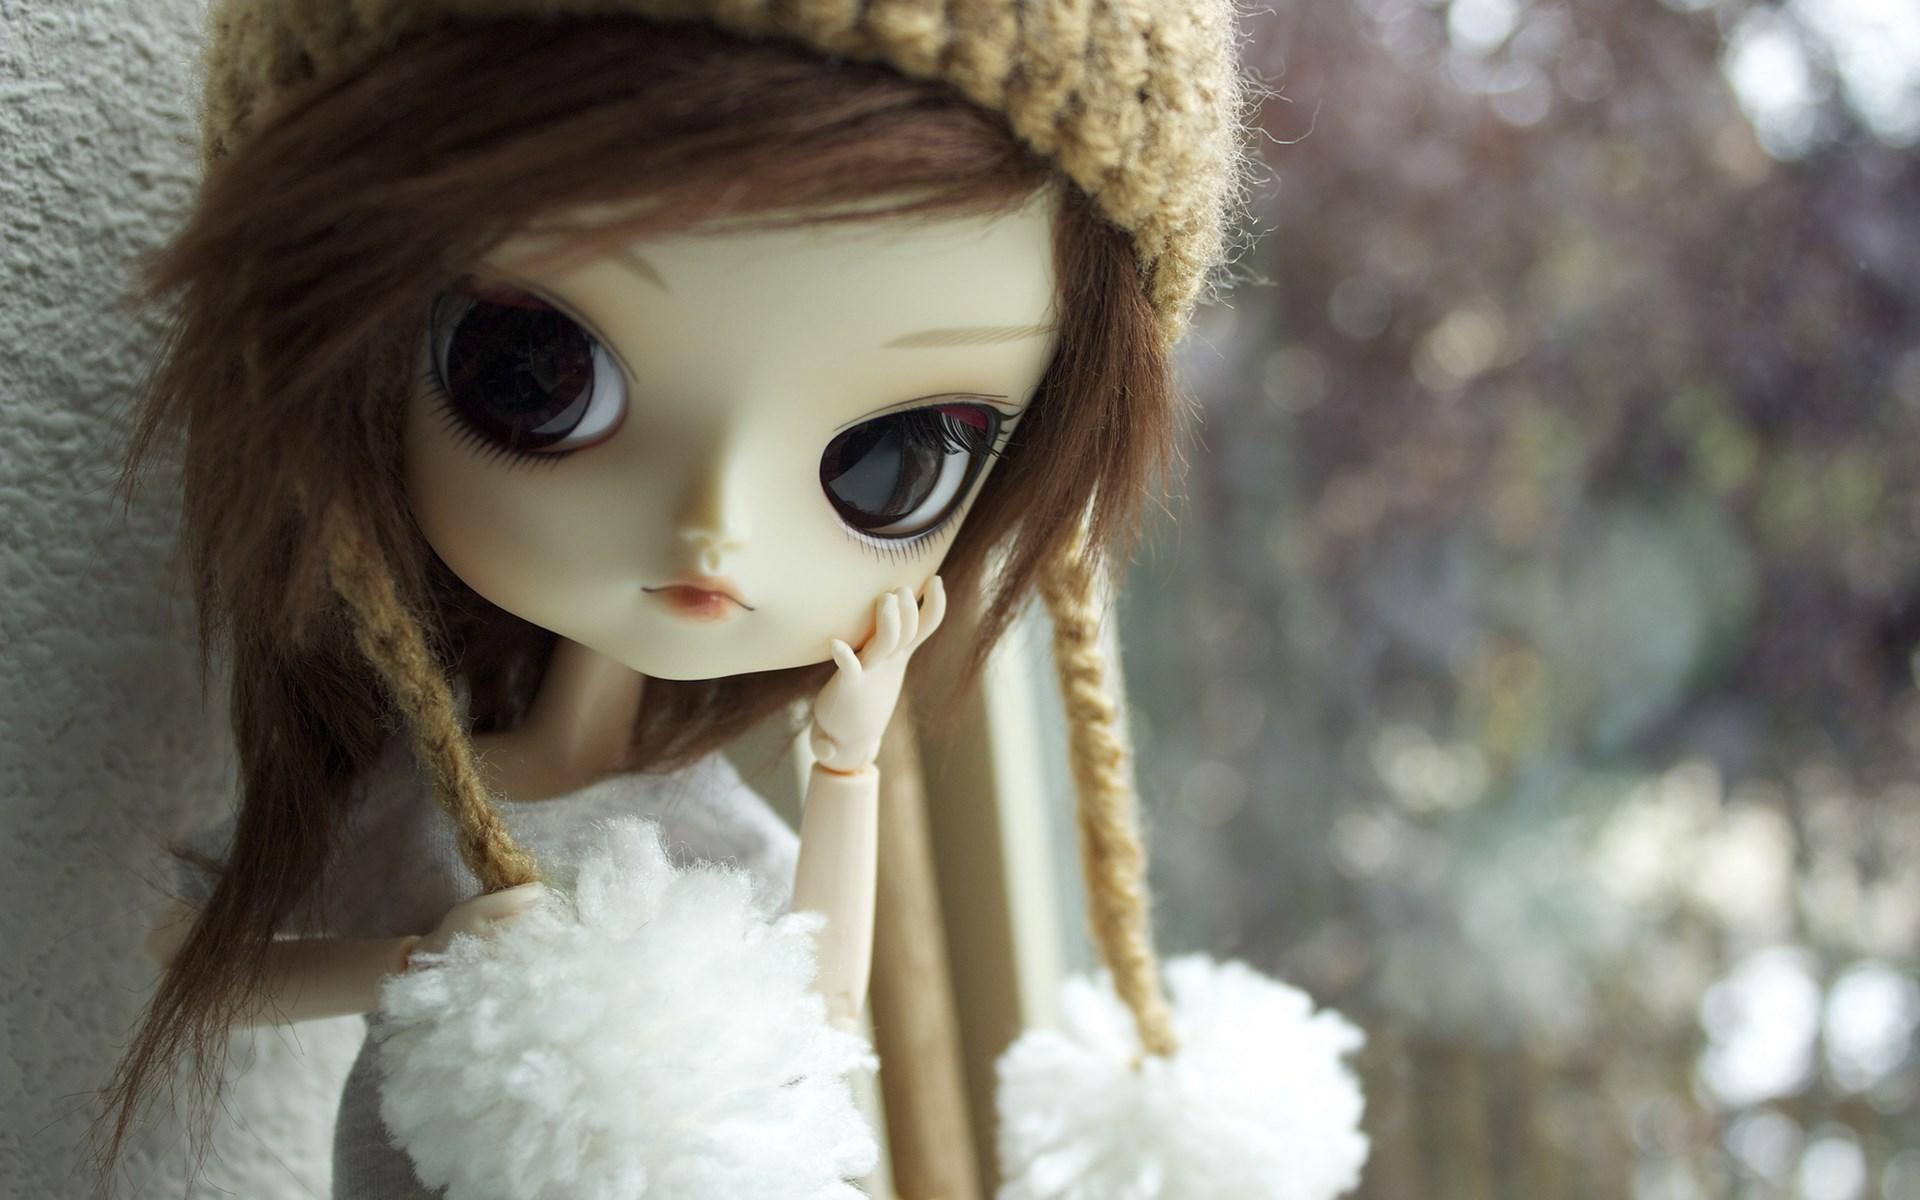 Cute Barbie Doll Wallpapers For Mobile Doll Wallpapers Hd Pixelstalk Net